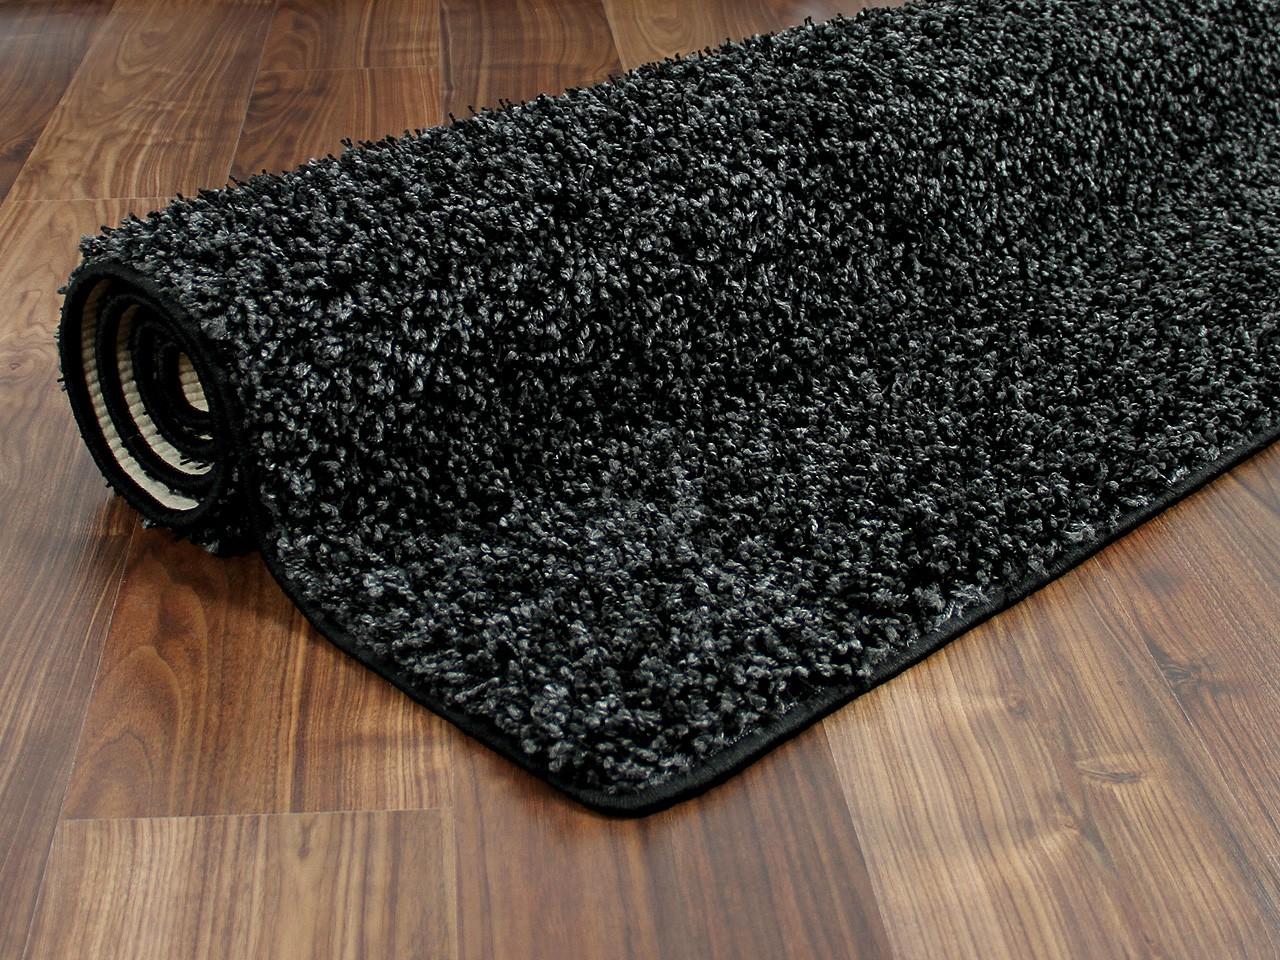 hochflor shaggy teppich dream anthrazit in 24 gr en teppiche hochflor langflor teppiche schwarz. Black Bedroom Furniture Sets. Home Design Ideas